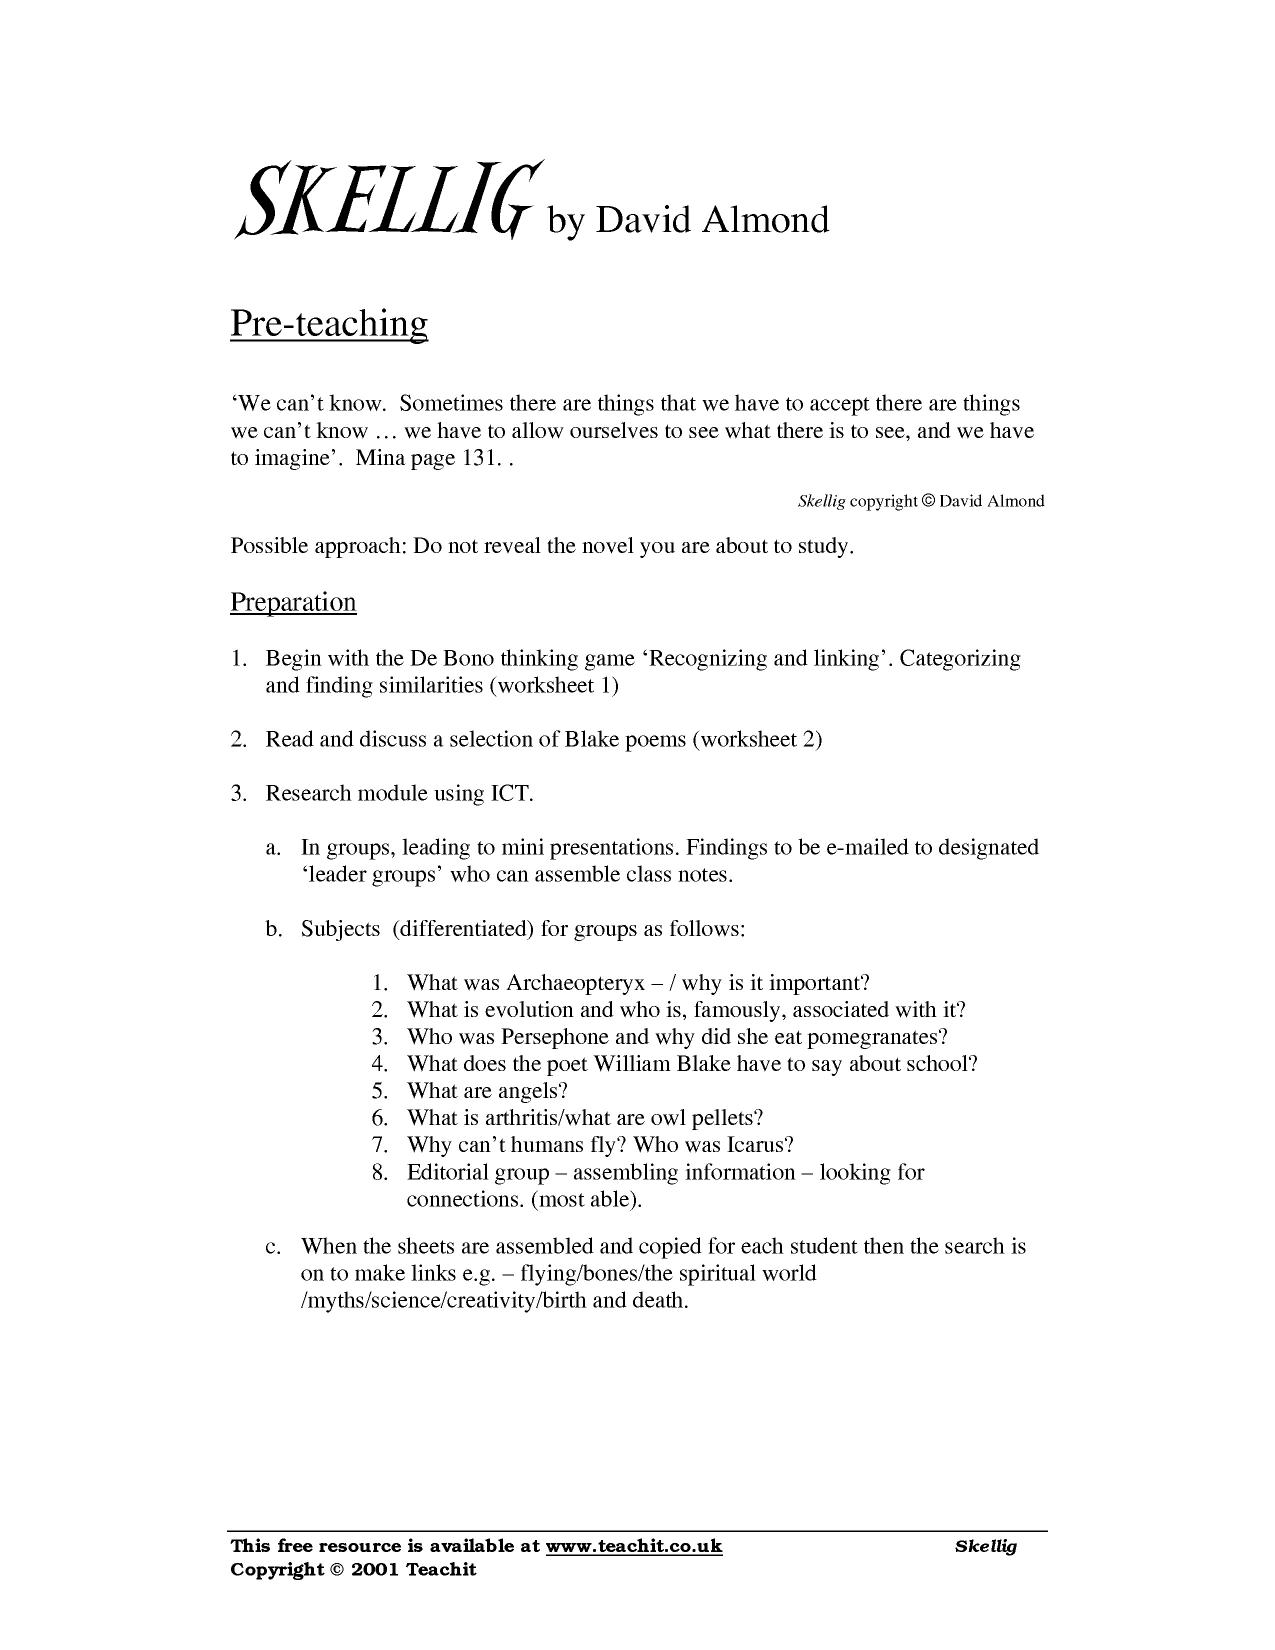 Worksheets Stone Fox Worksheets worksheet stone fox worksheets mytourvn study site montrealsocialmedia and skellig by david almond ks3 prose